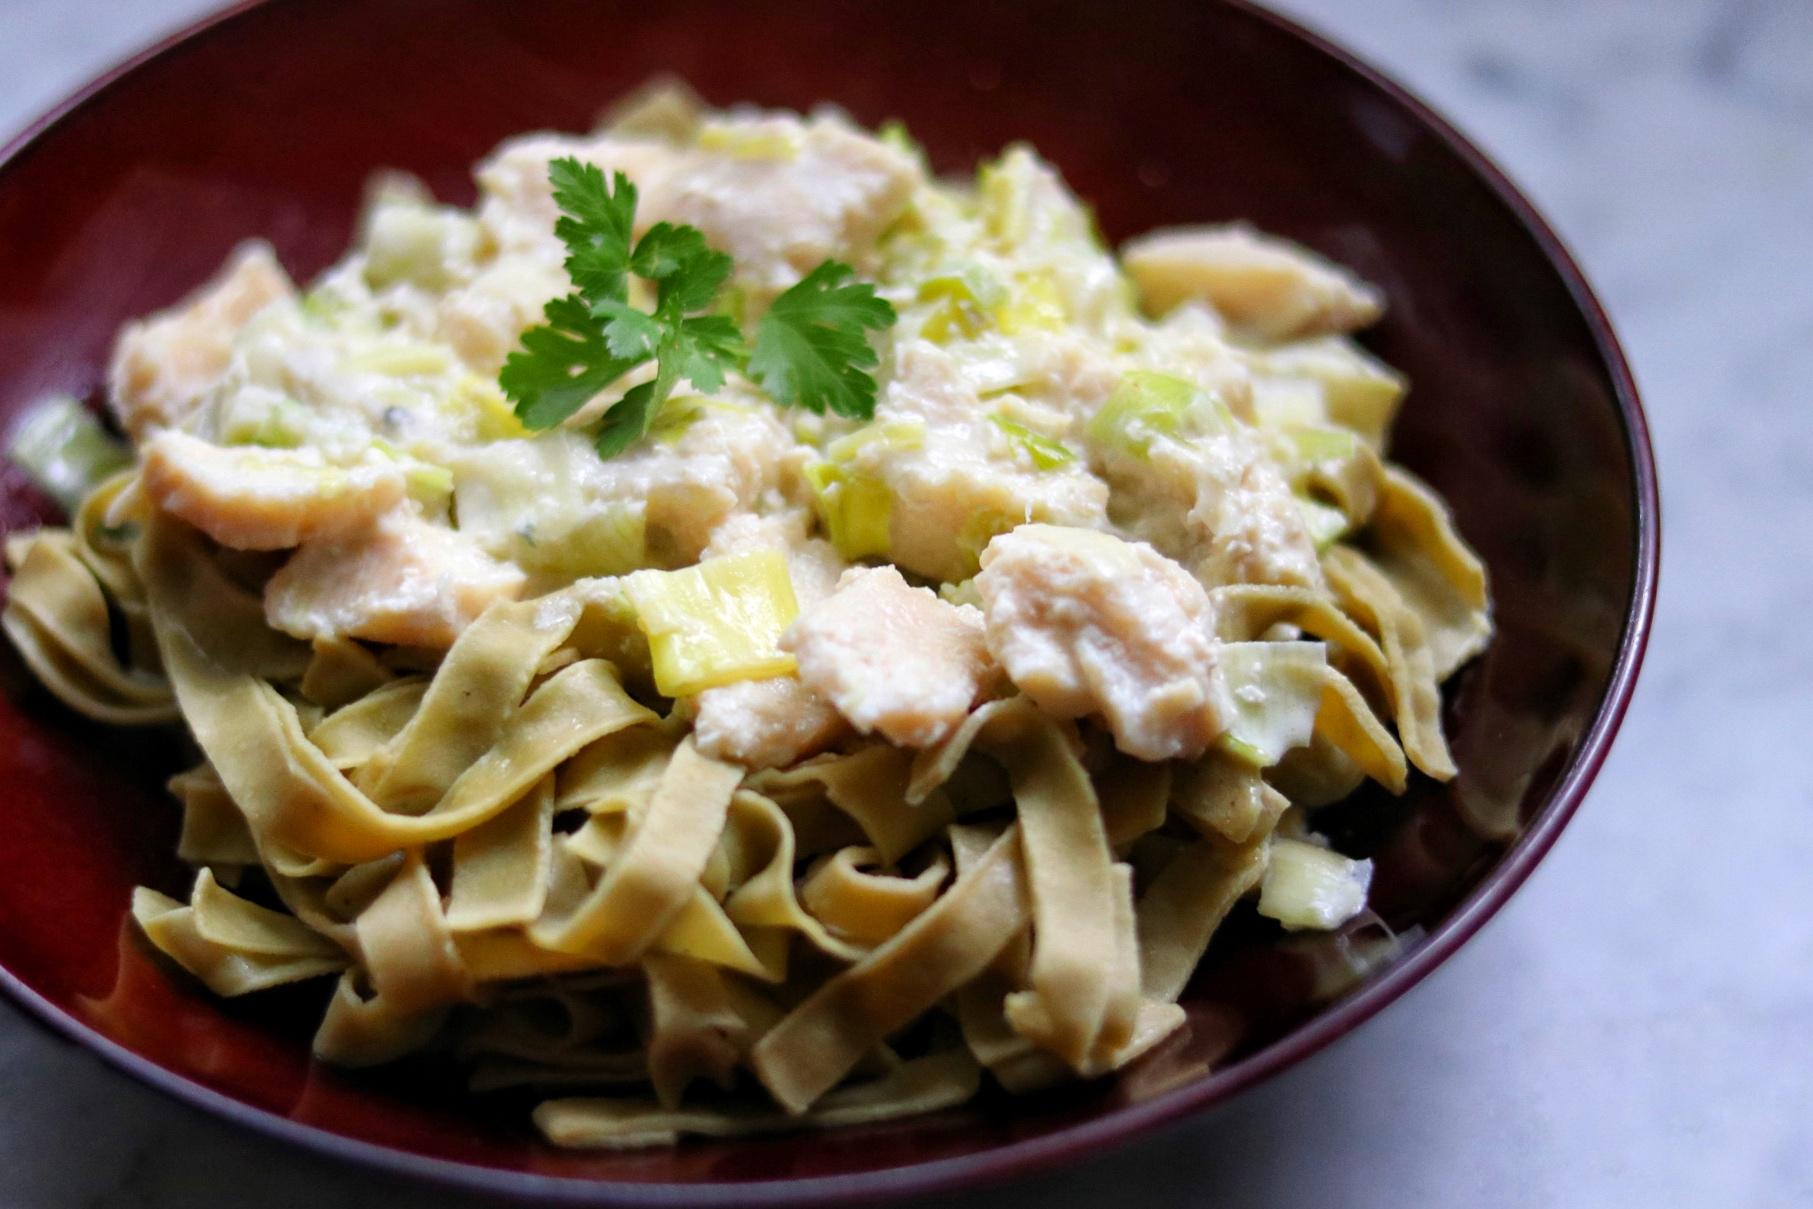 Fettuccine with Chicken, Leeks, and Gorgonzola